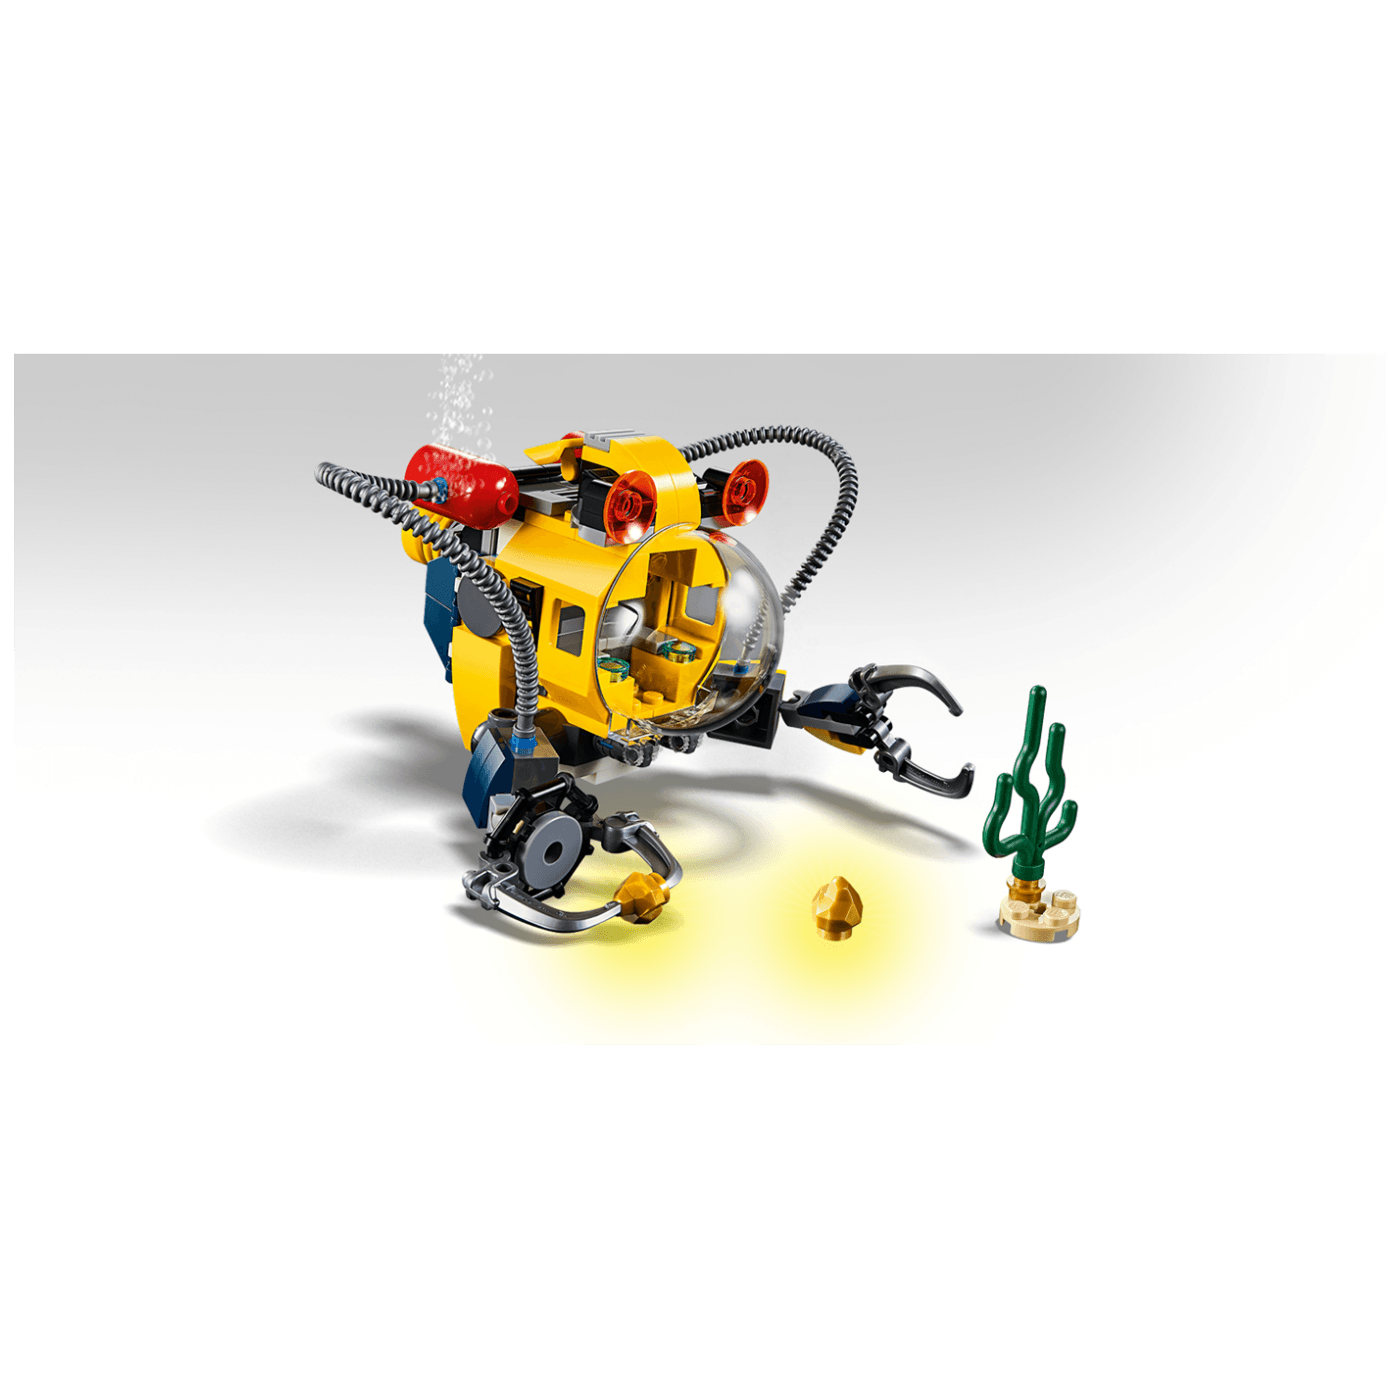 Podvodni robot, LEGO Creator